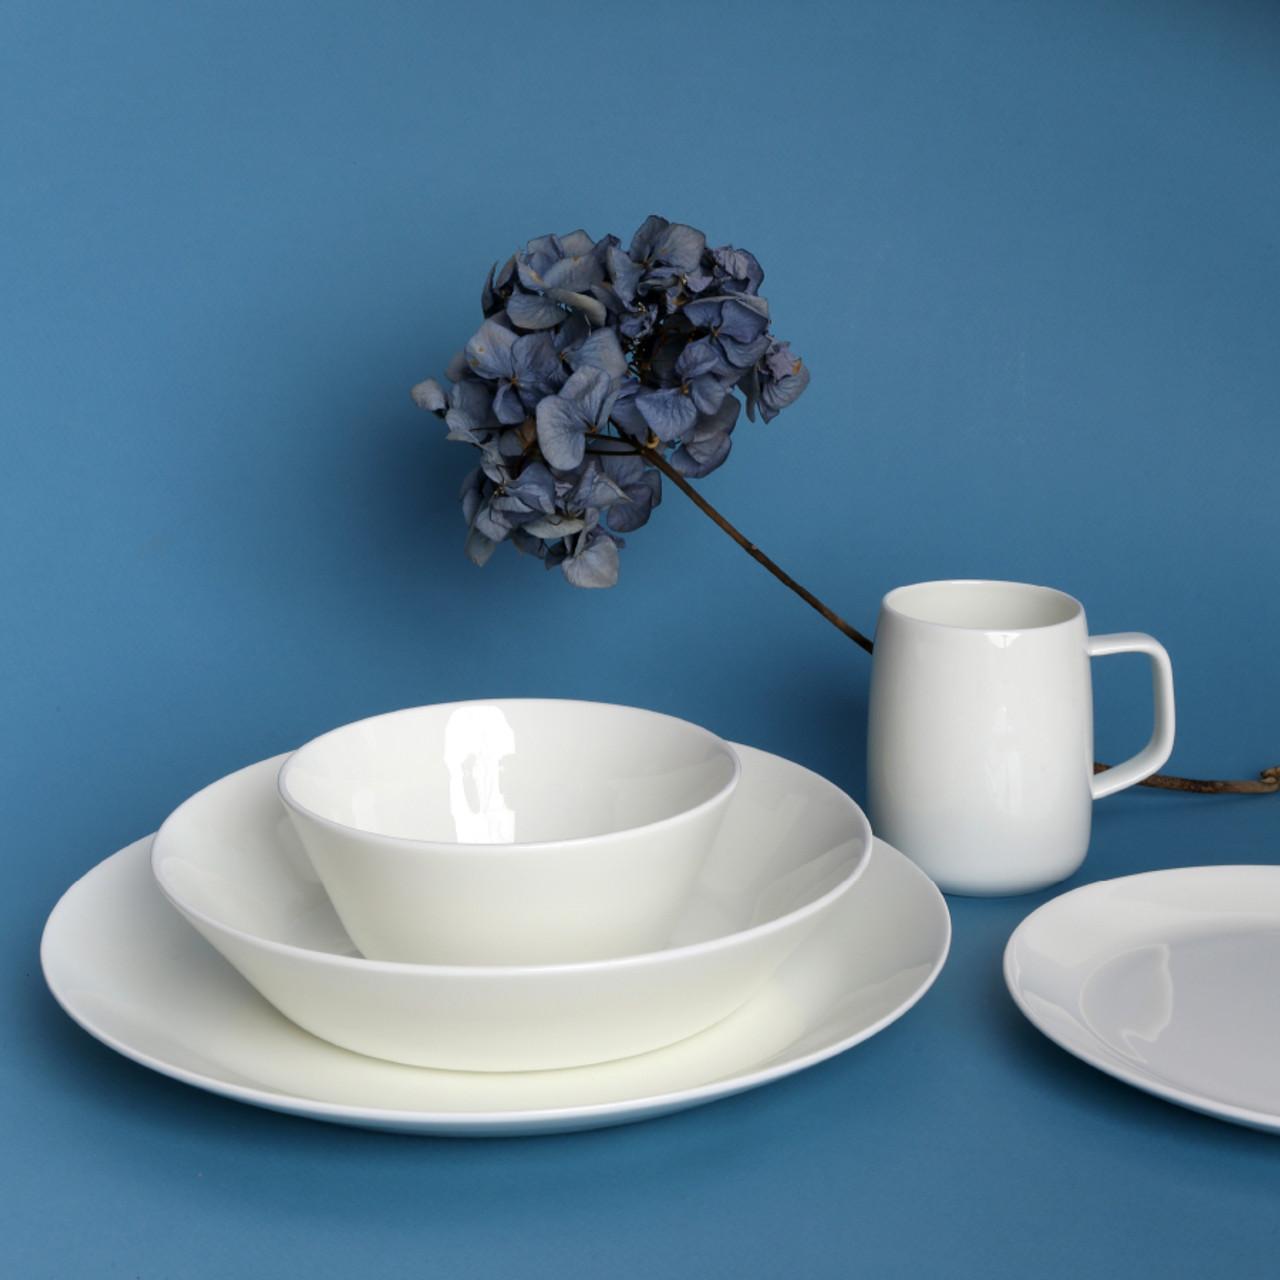 Lotus - Cereal Bowl 4 piece set